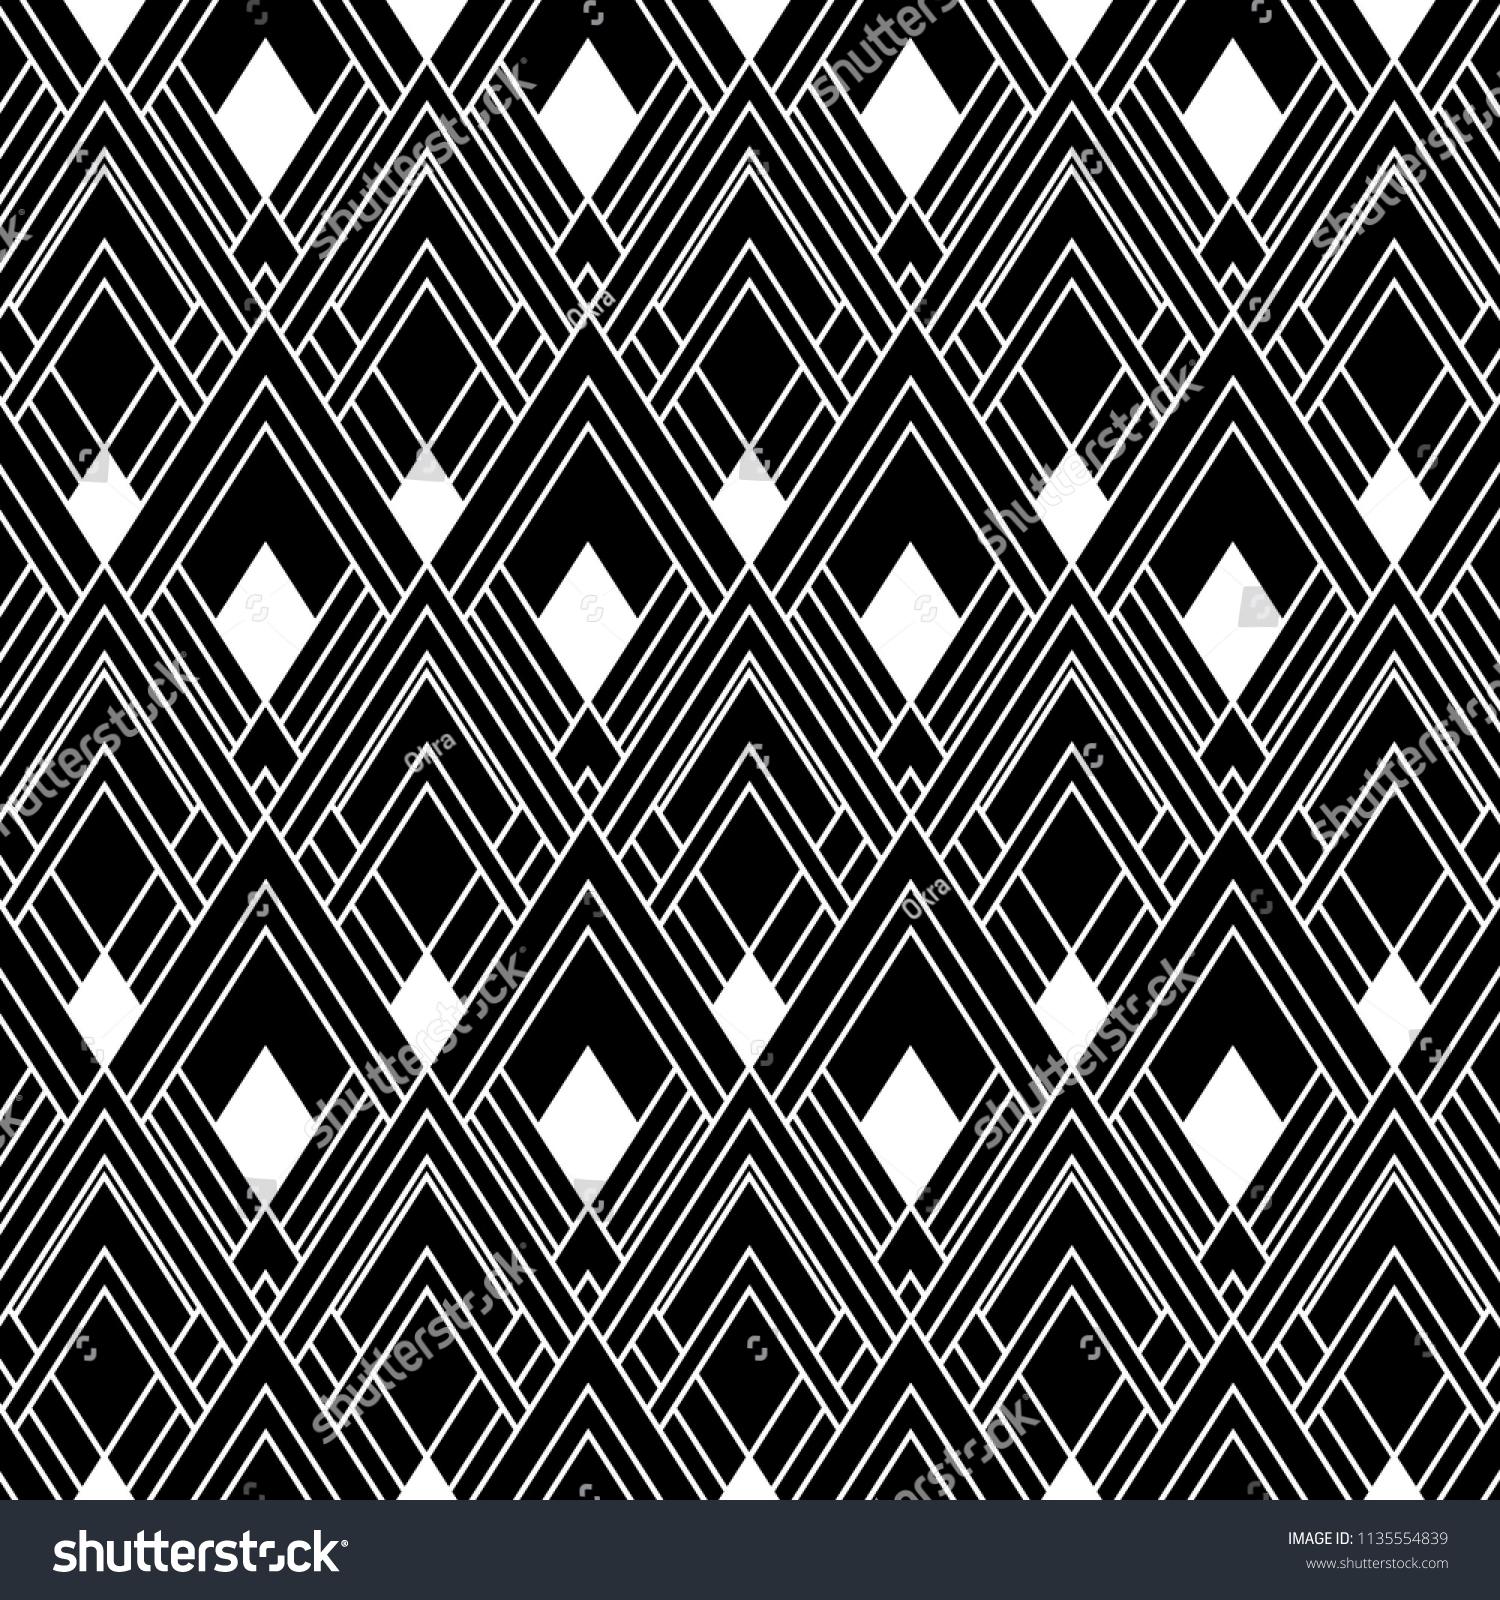 Seamless Art Deco Black White Wallpaper Stock Vektorgrafik